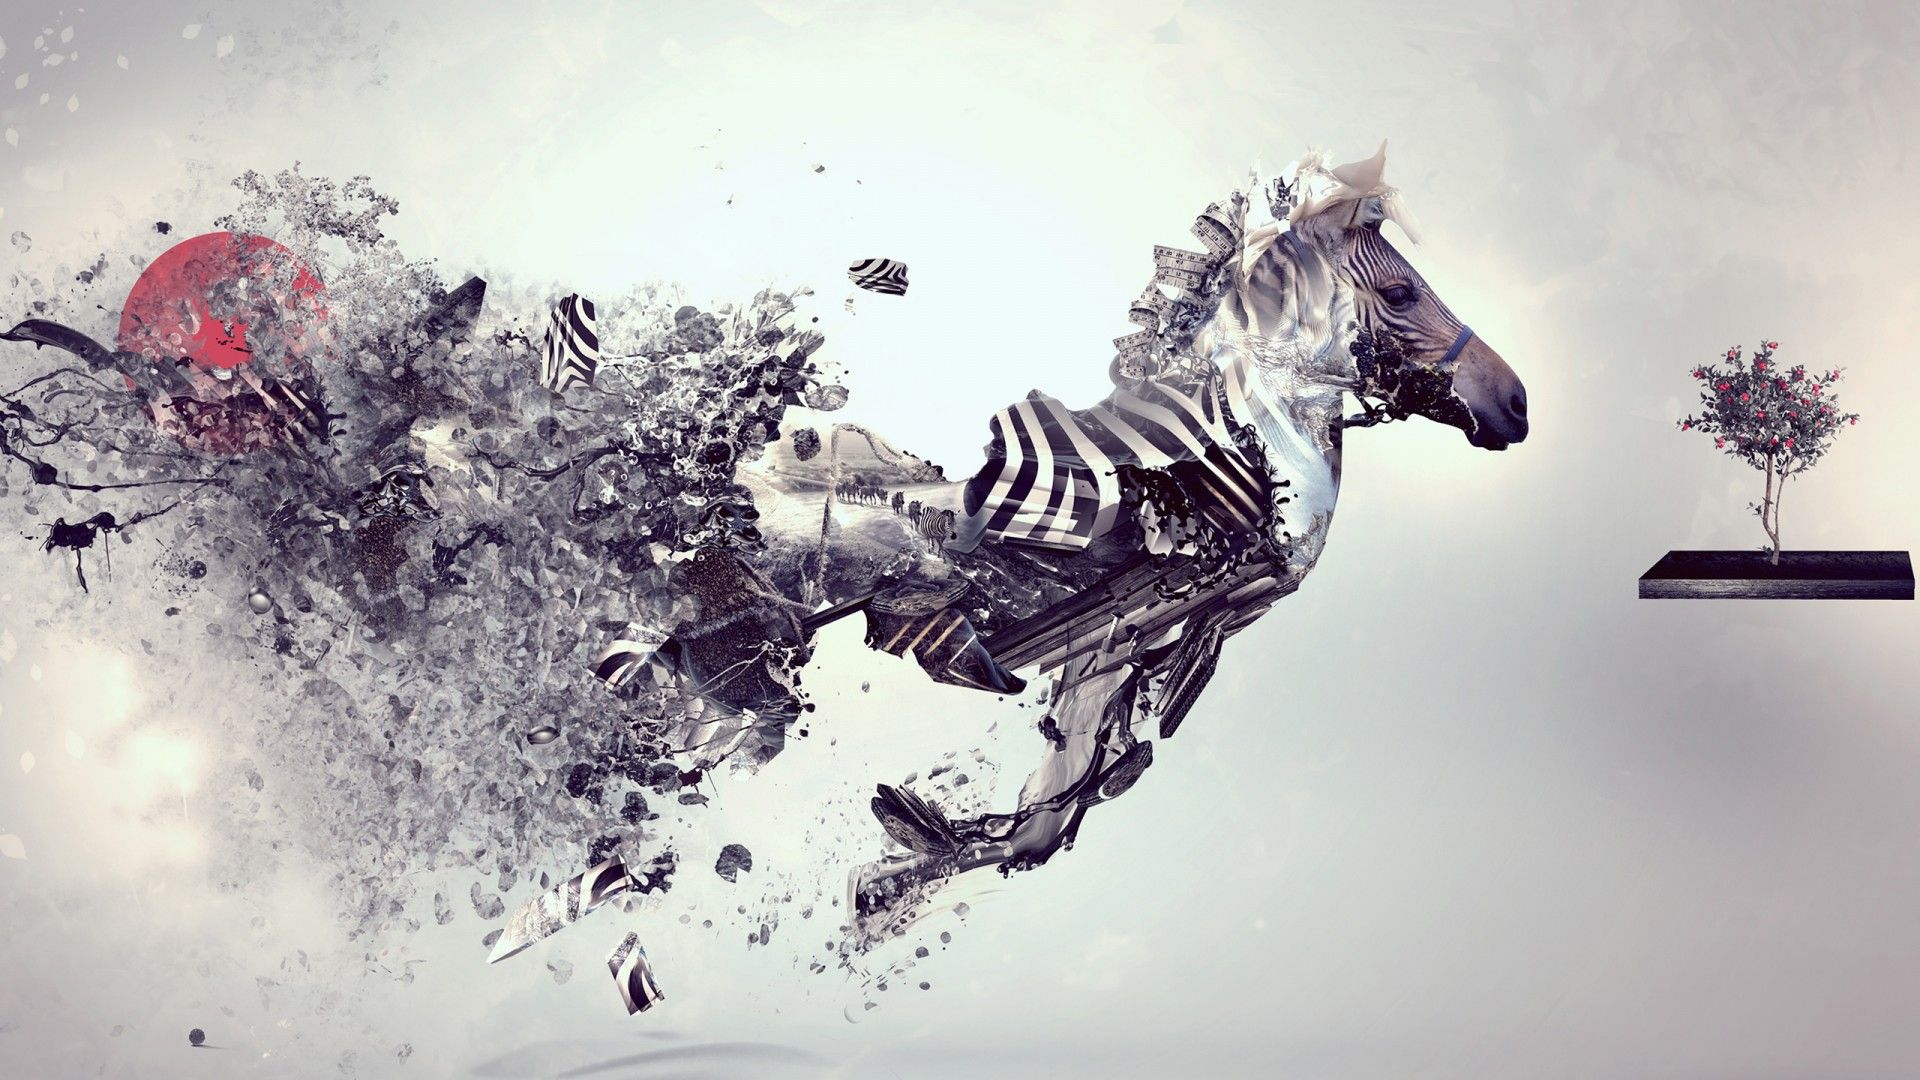 Download Wallpaper Horse Collage - 12f7ce3ecdb267e78dc235a9aa3957a1  Snapshot_1002419.jpg